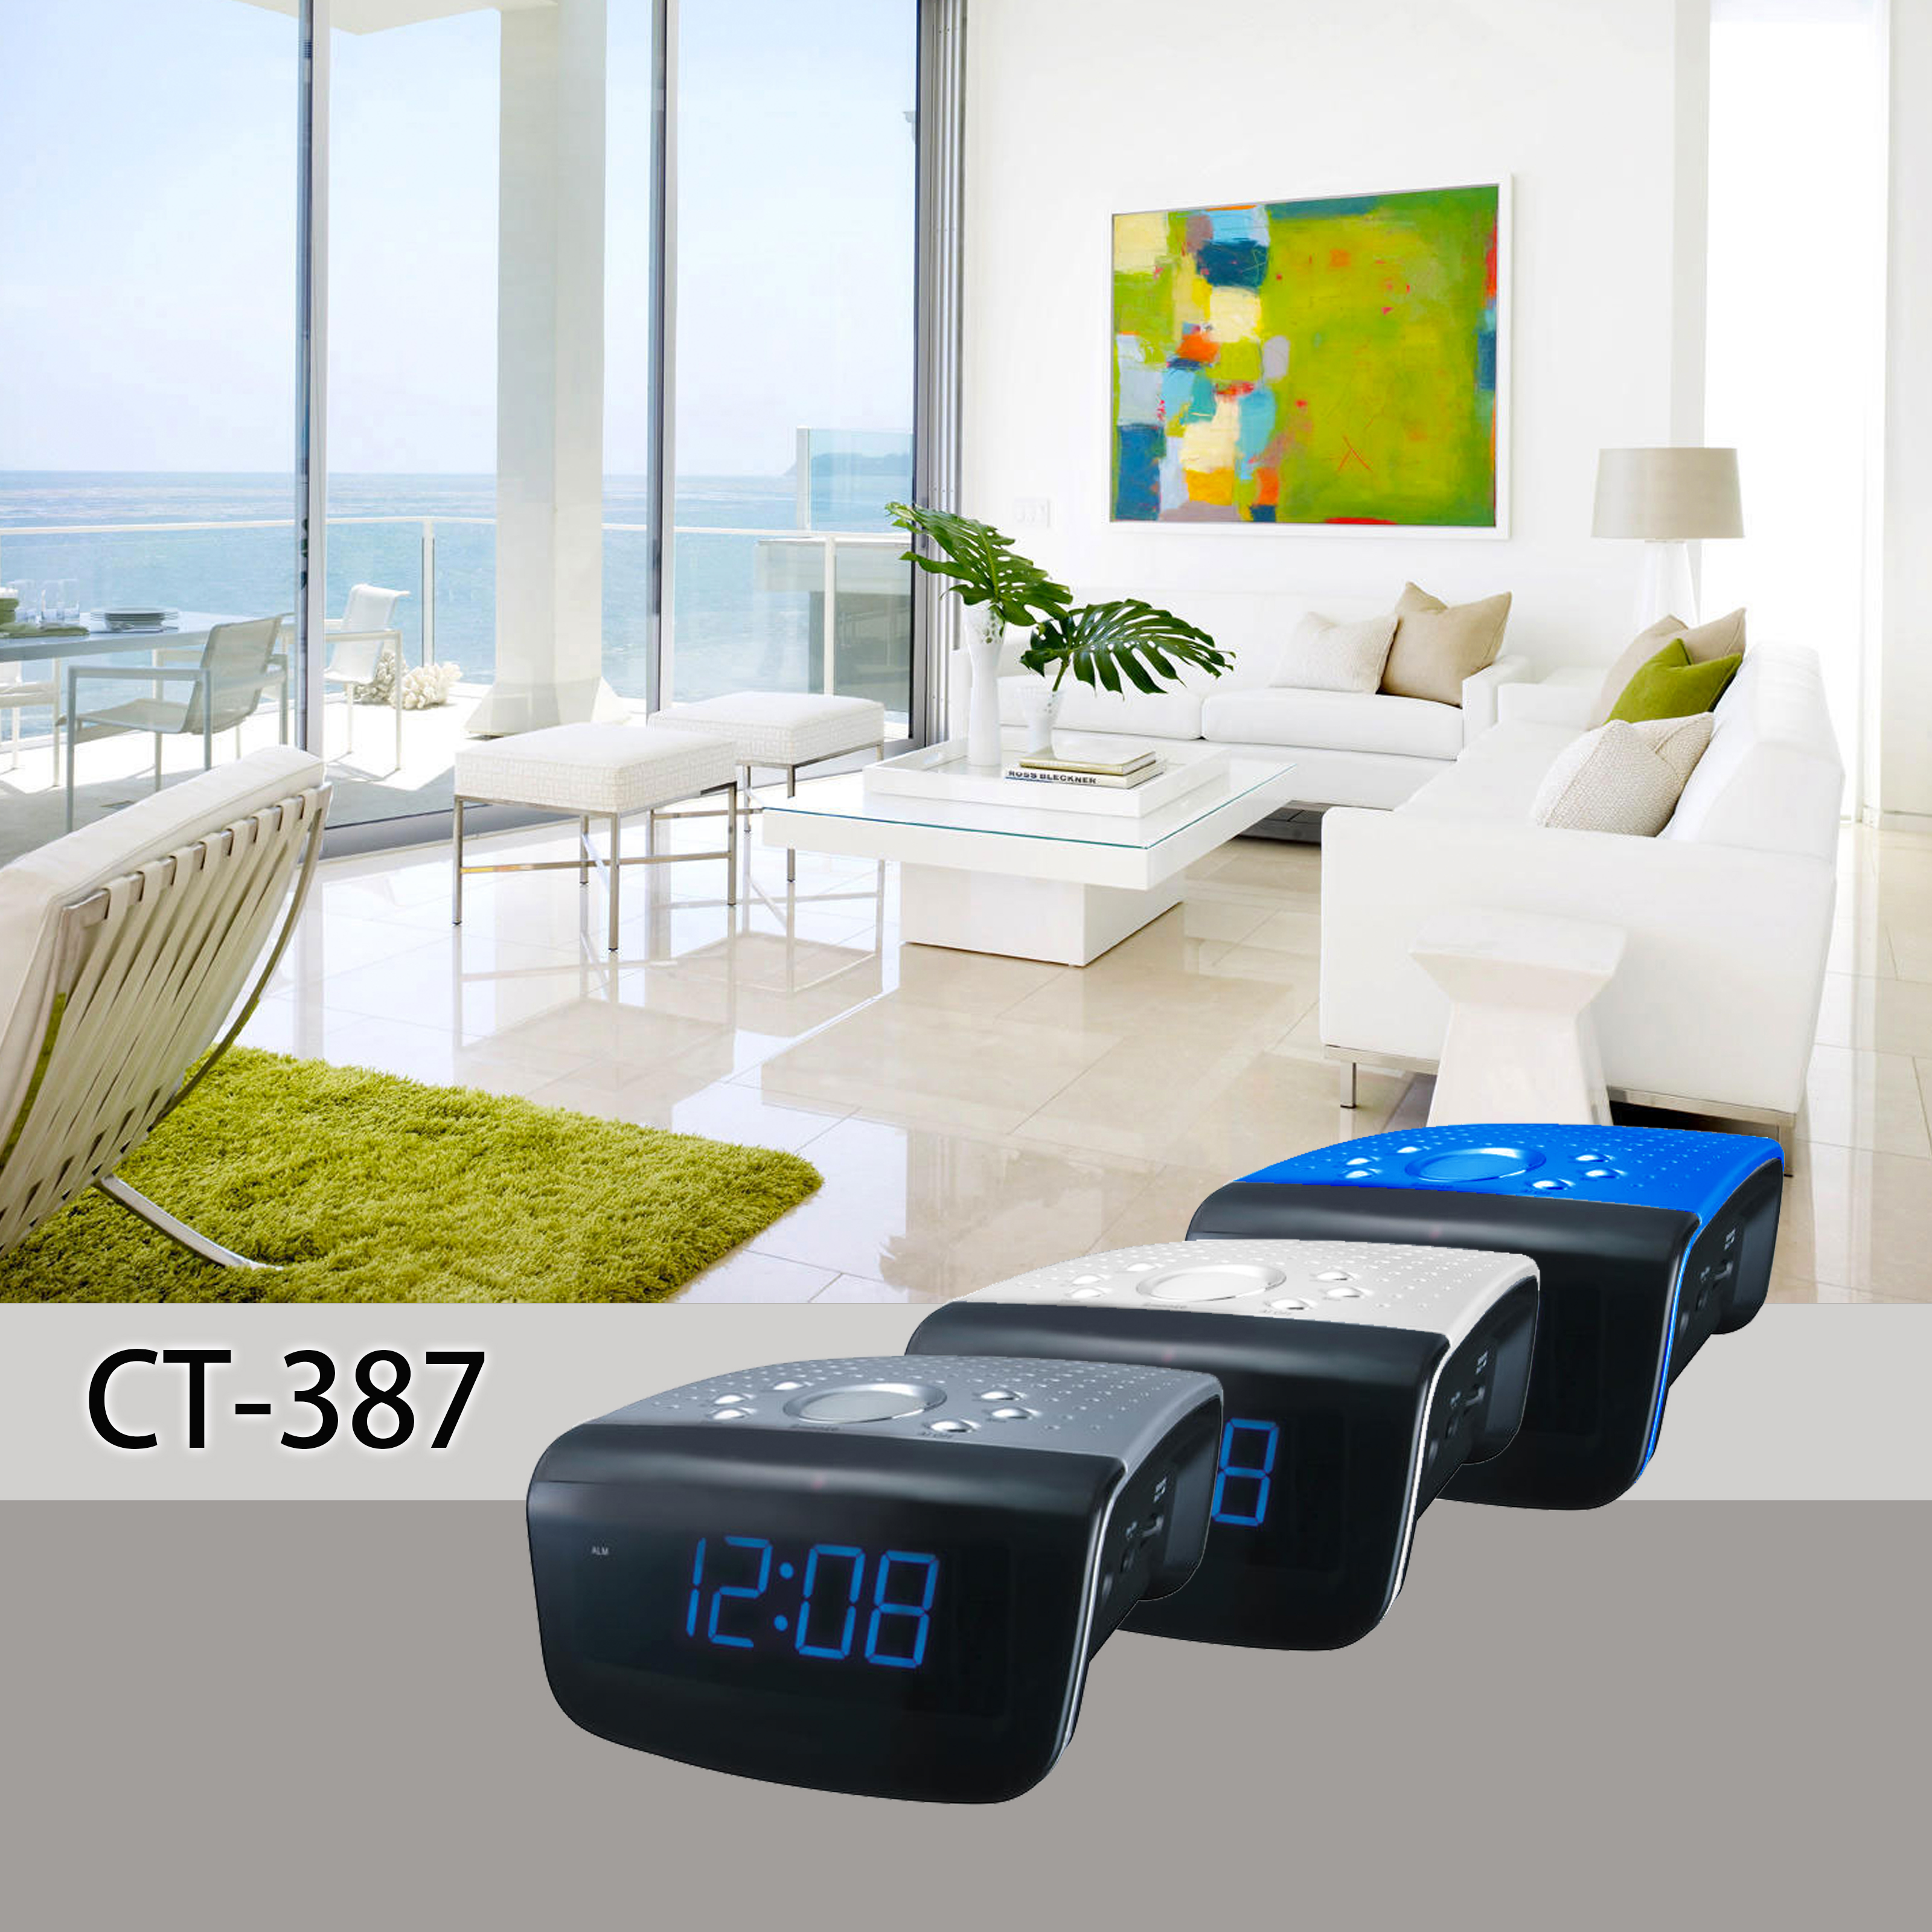 CT-387 livingroom.jpg